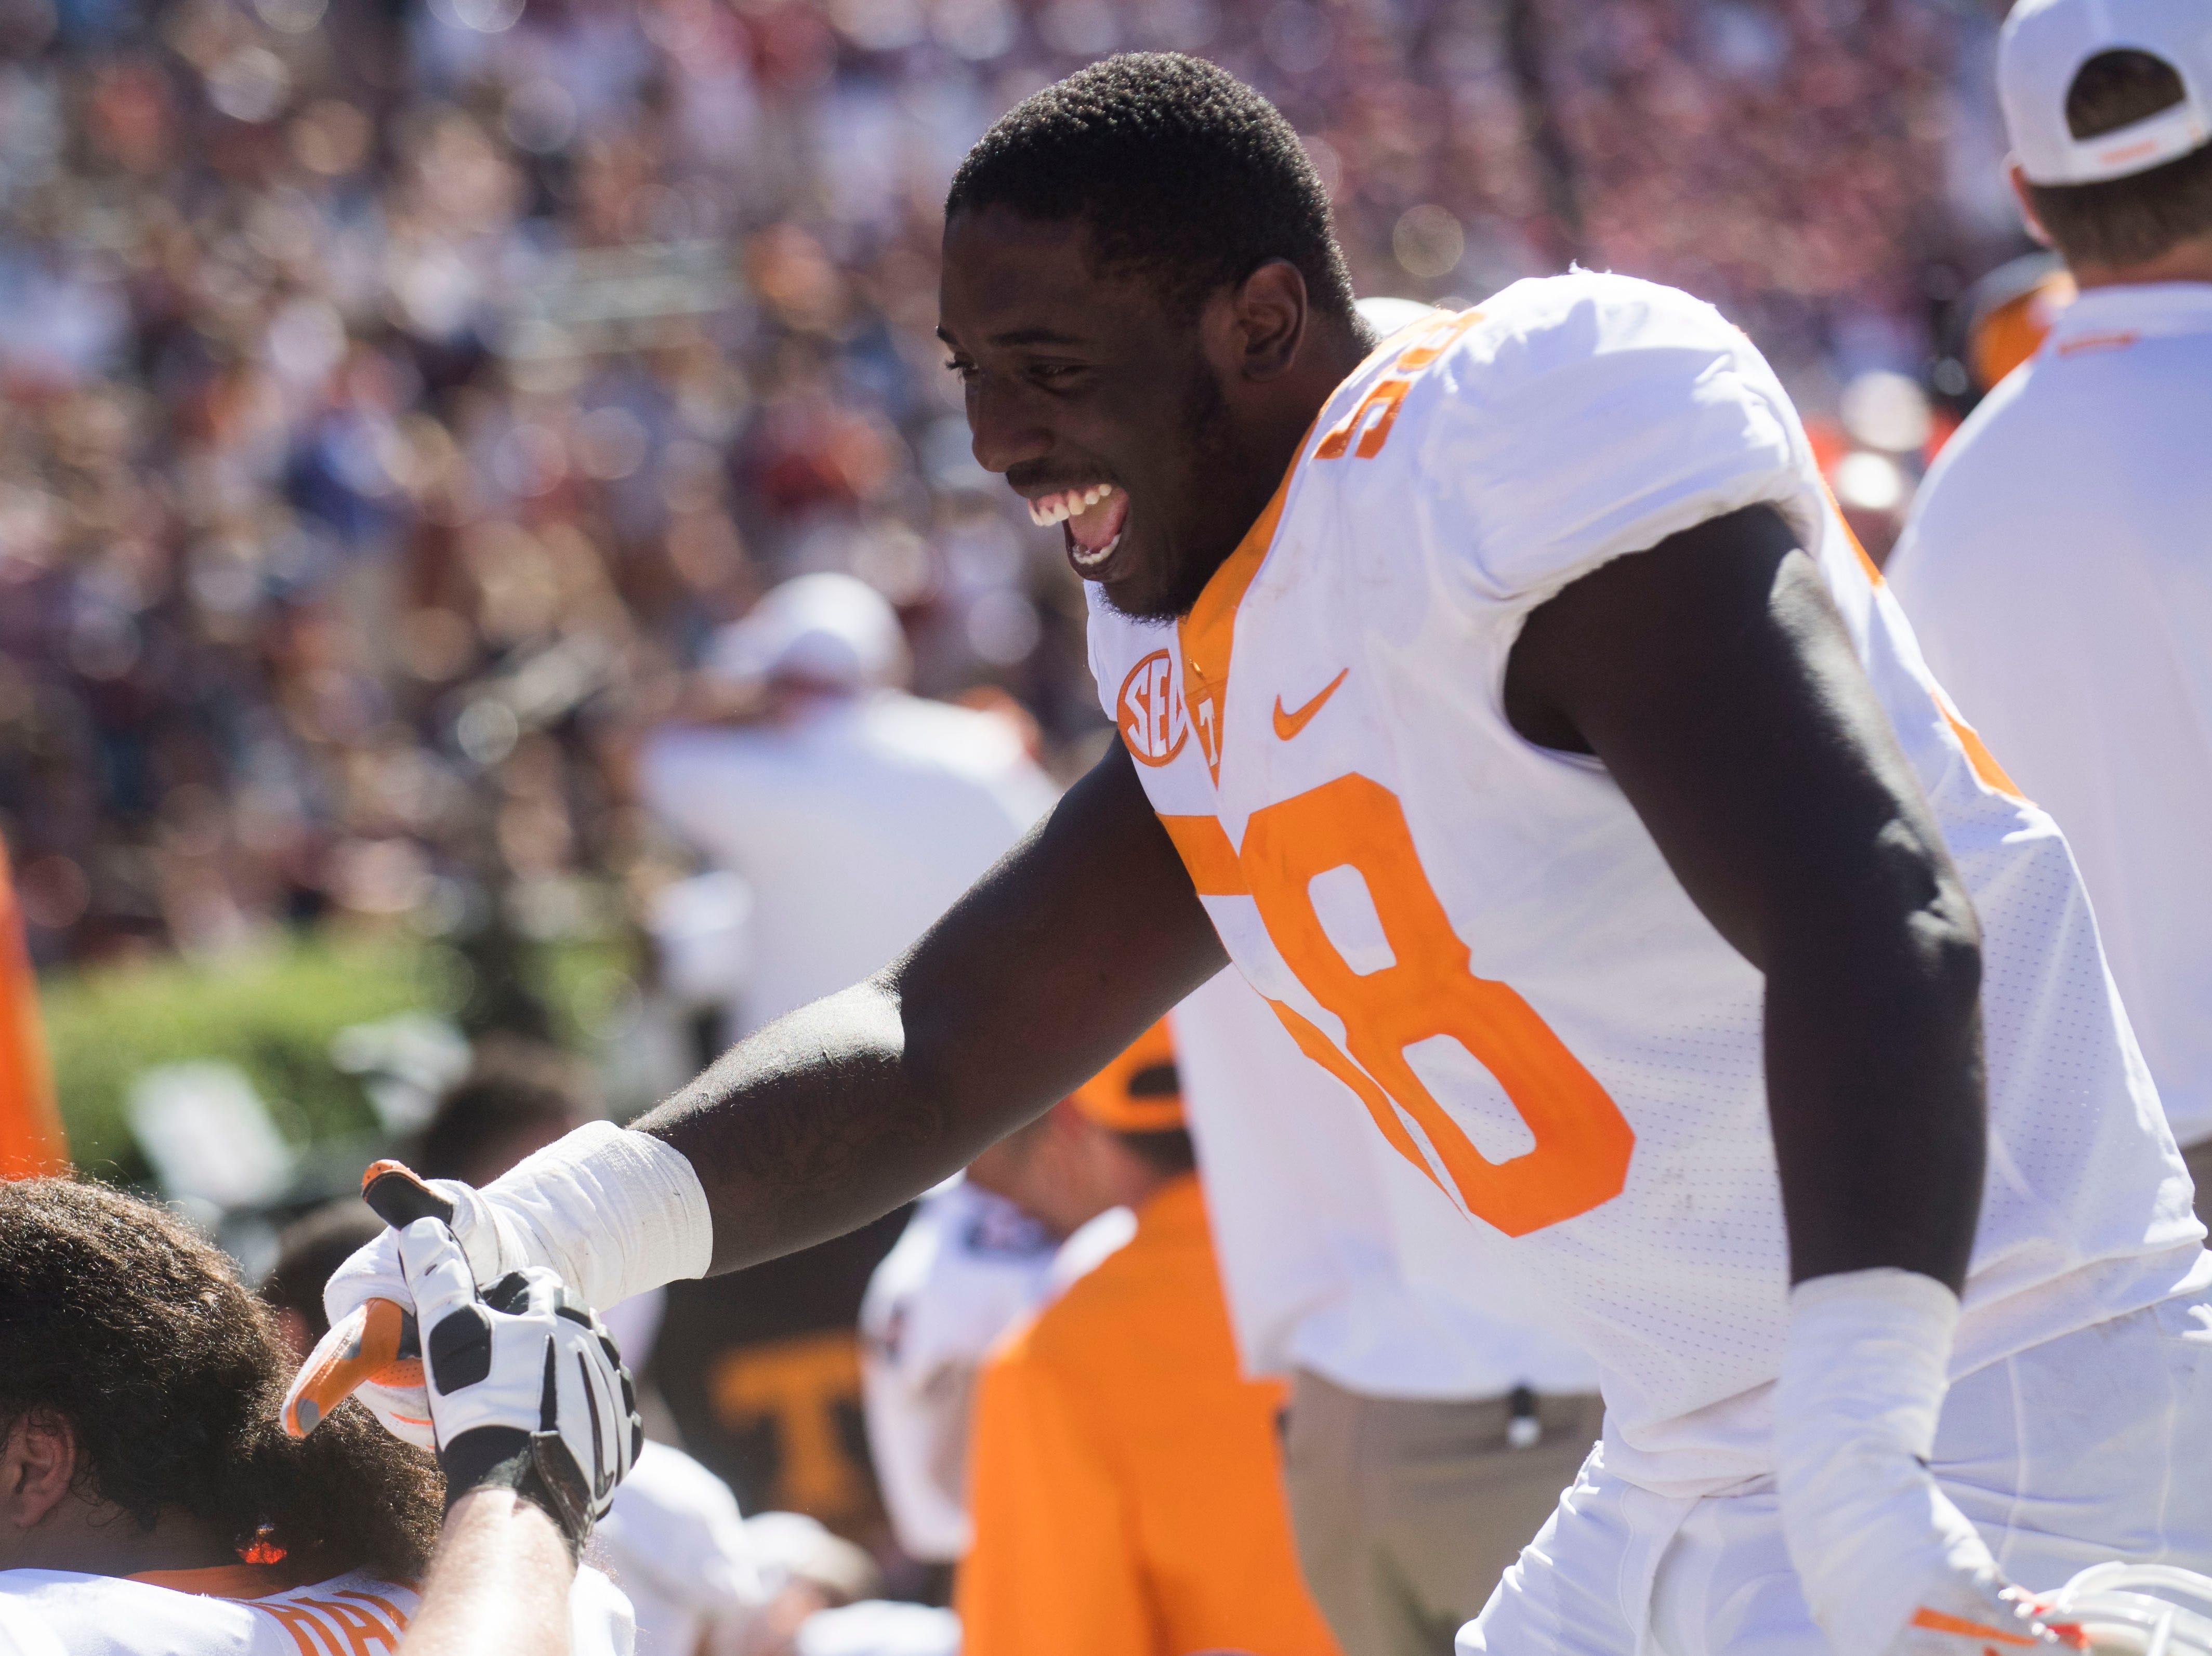 Tennessee offensive lineman Jahmir Johnson celebrates after Tennessee's win over Auburn at Jordan-Hare Stadium in Auburn, Ala. Saturday, Oct. 13, 2018. Tennessee defeated Auburn 30-24.